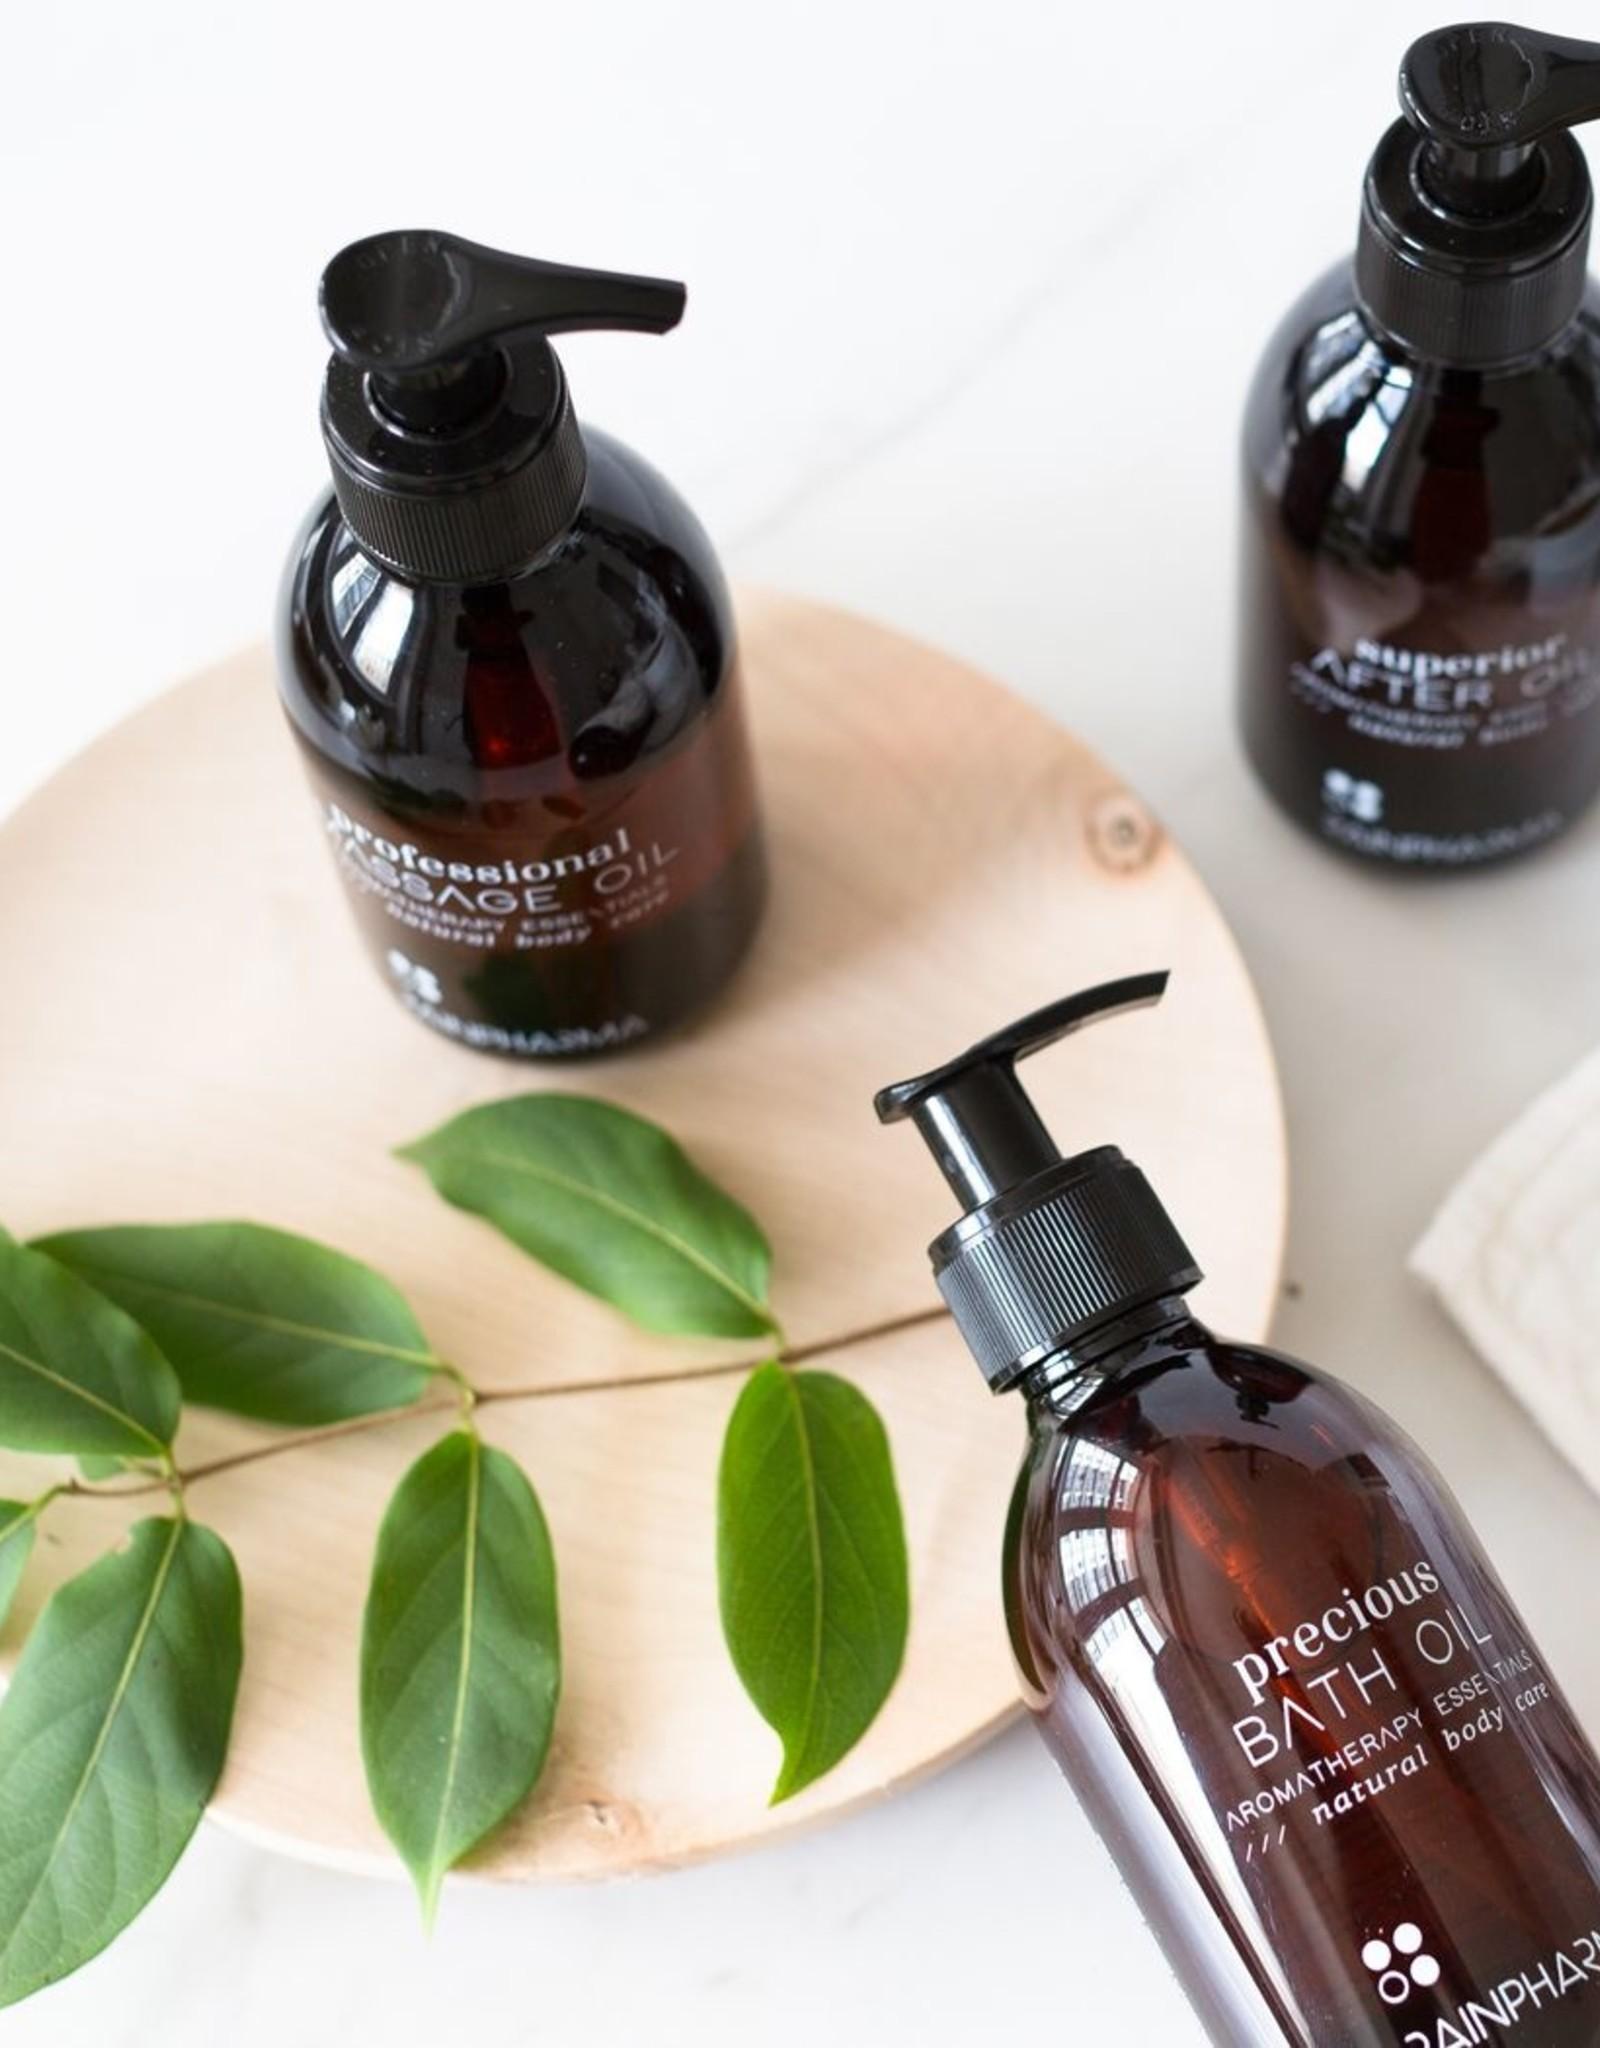 RainPharma Rainpharma - Precious Bath Oil 250ml